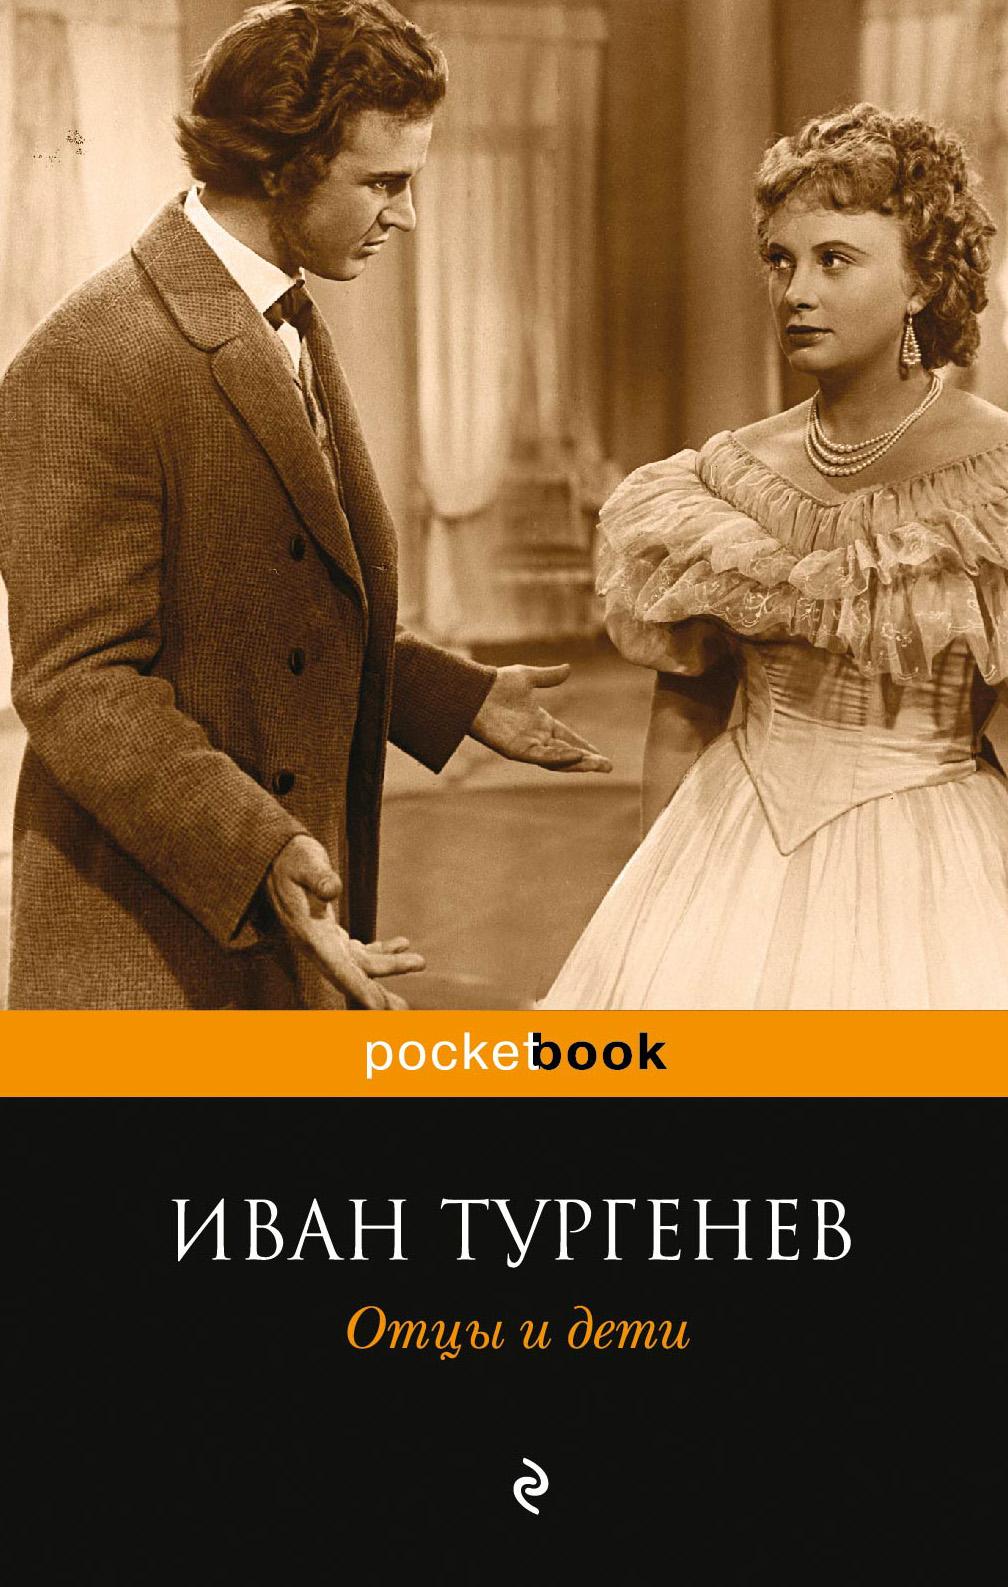 Алексей бобл серия сталкер читать онлайн